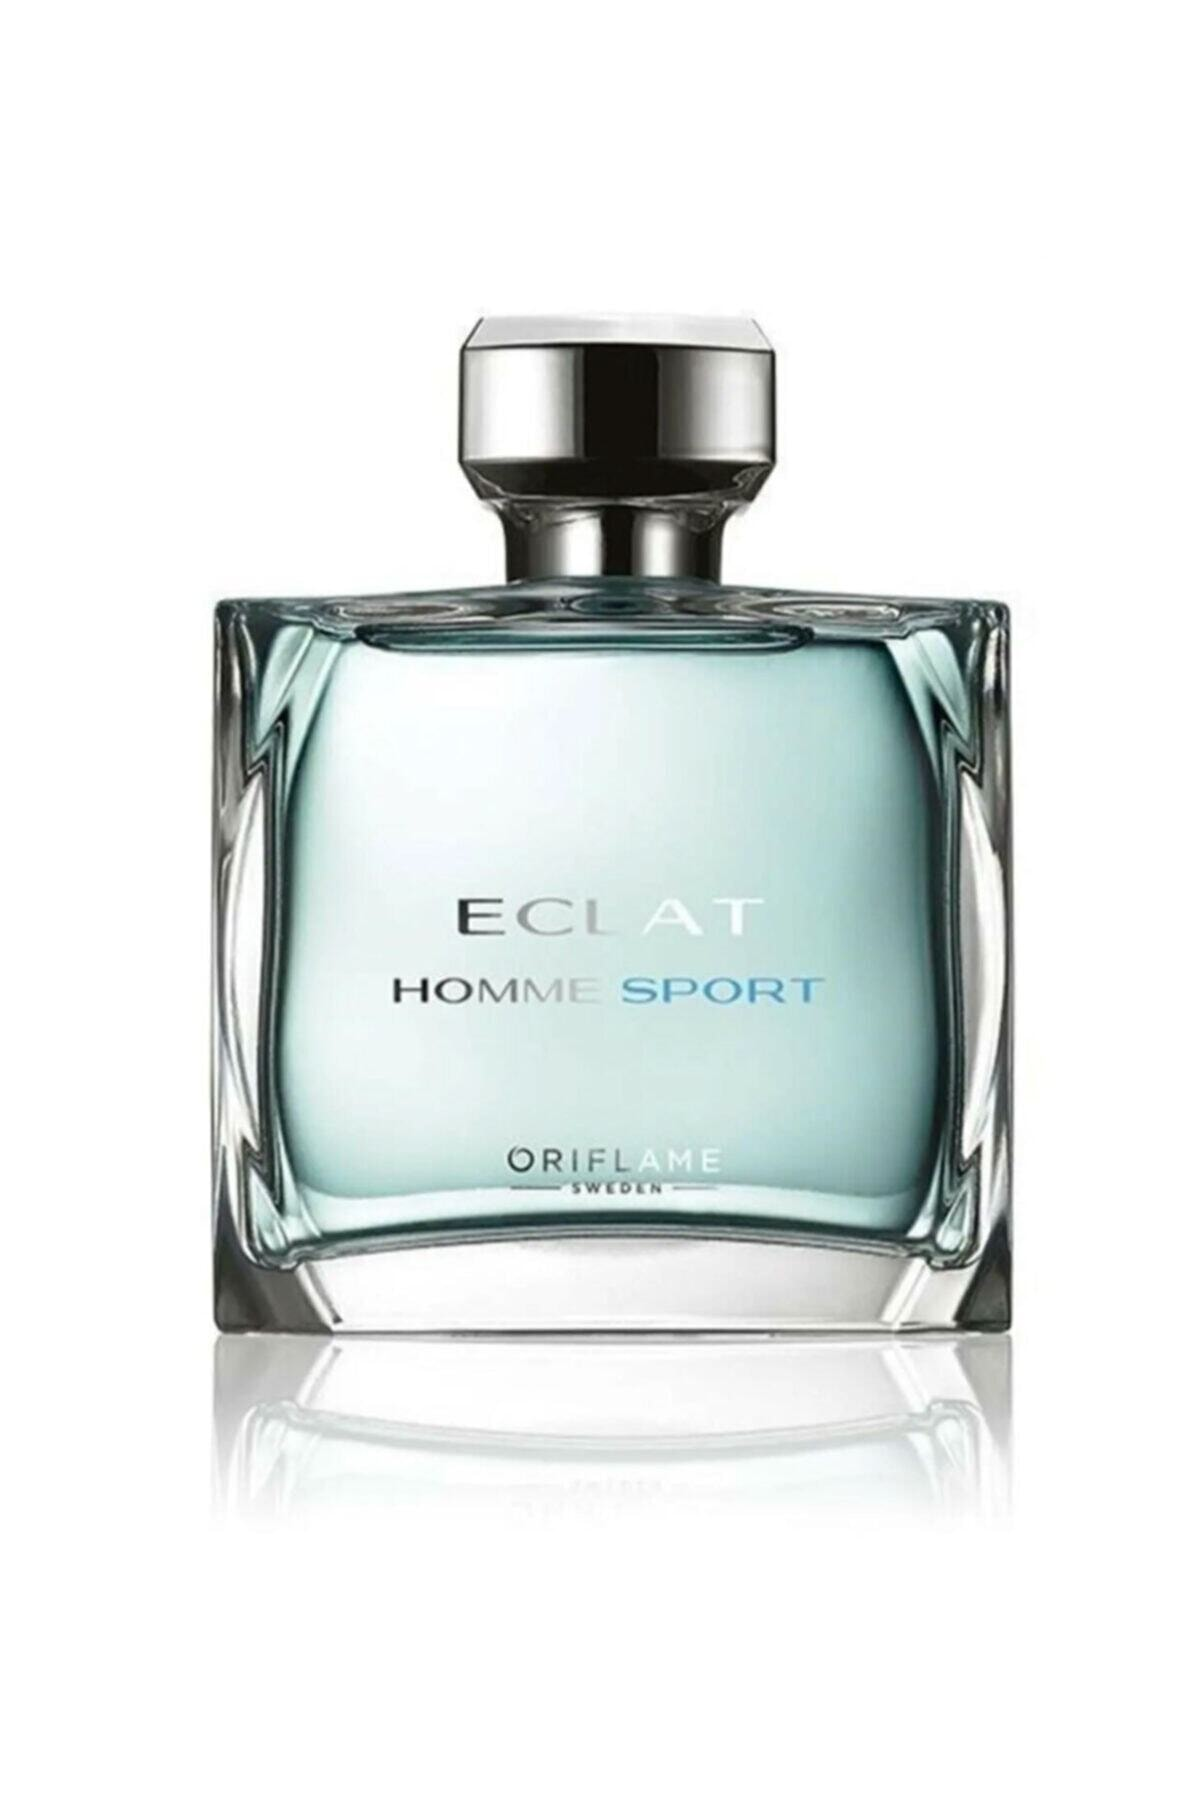 Oriflame Eclat Homme Sport Edt 1